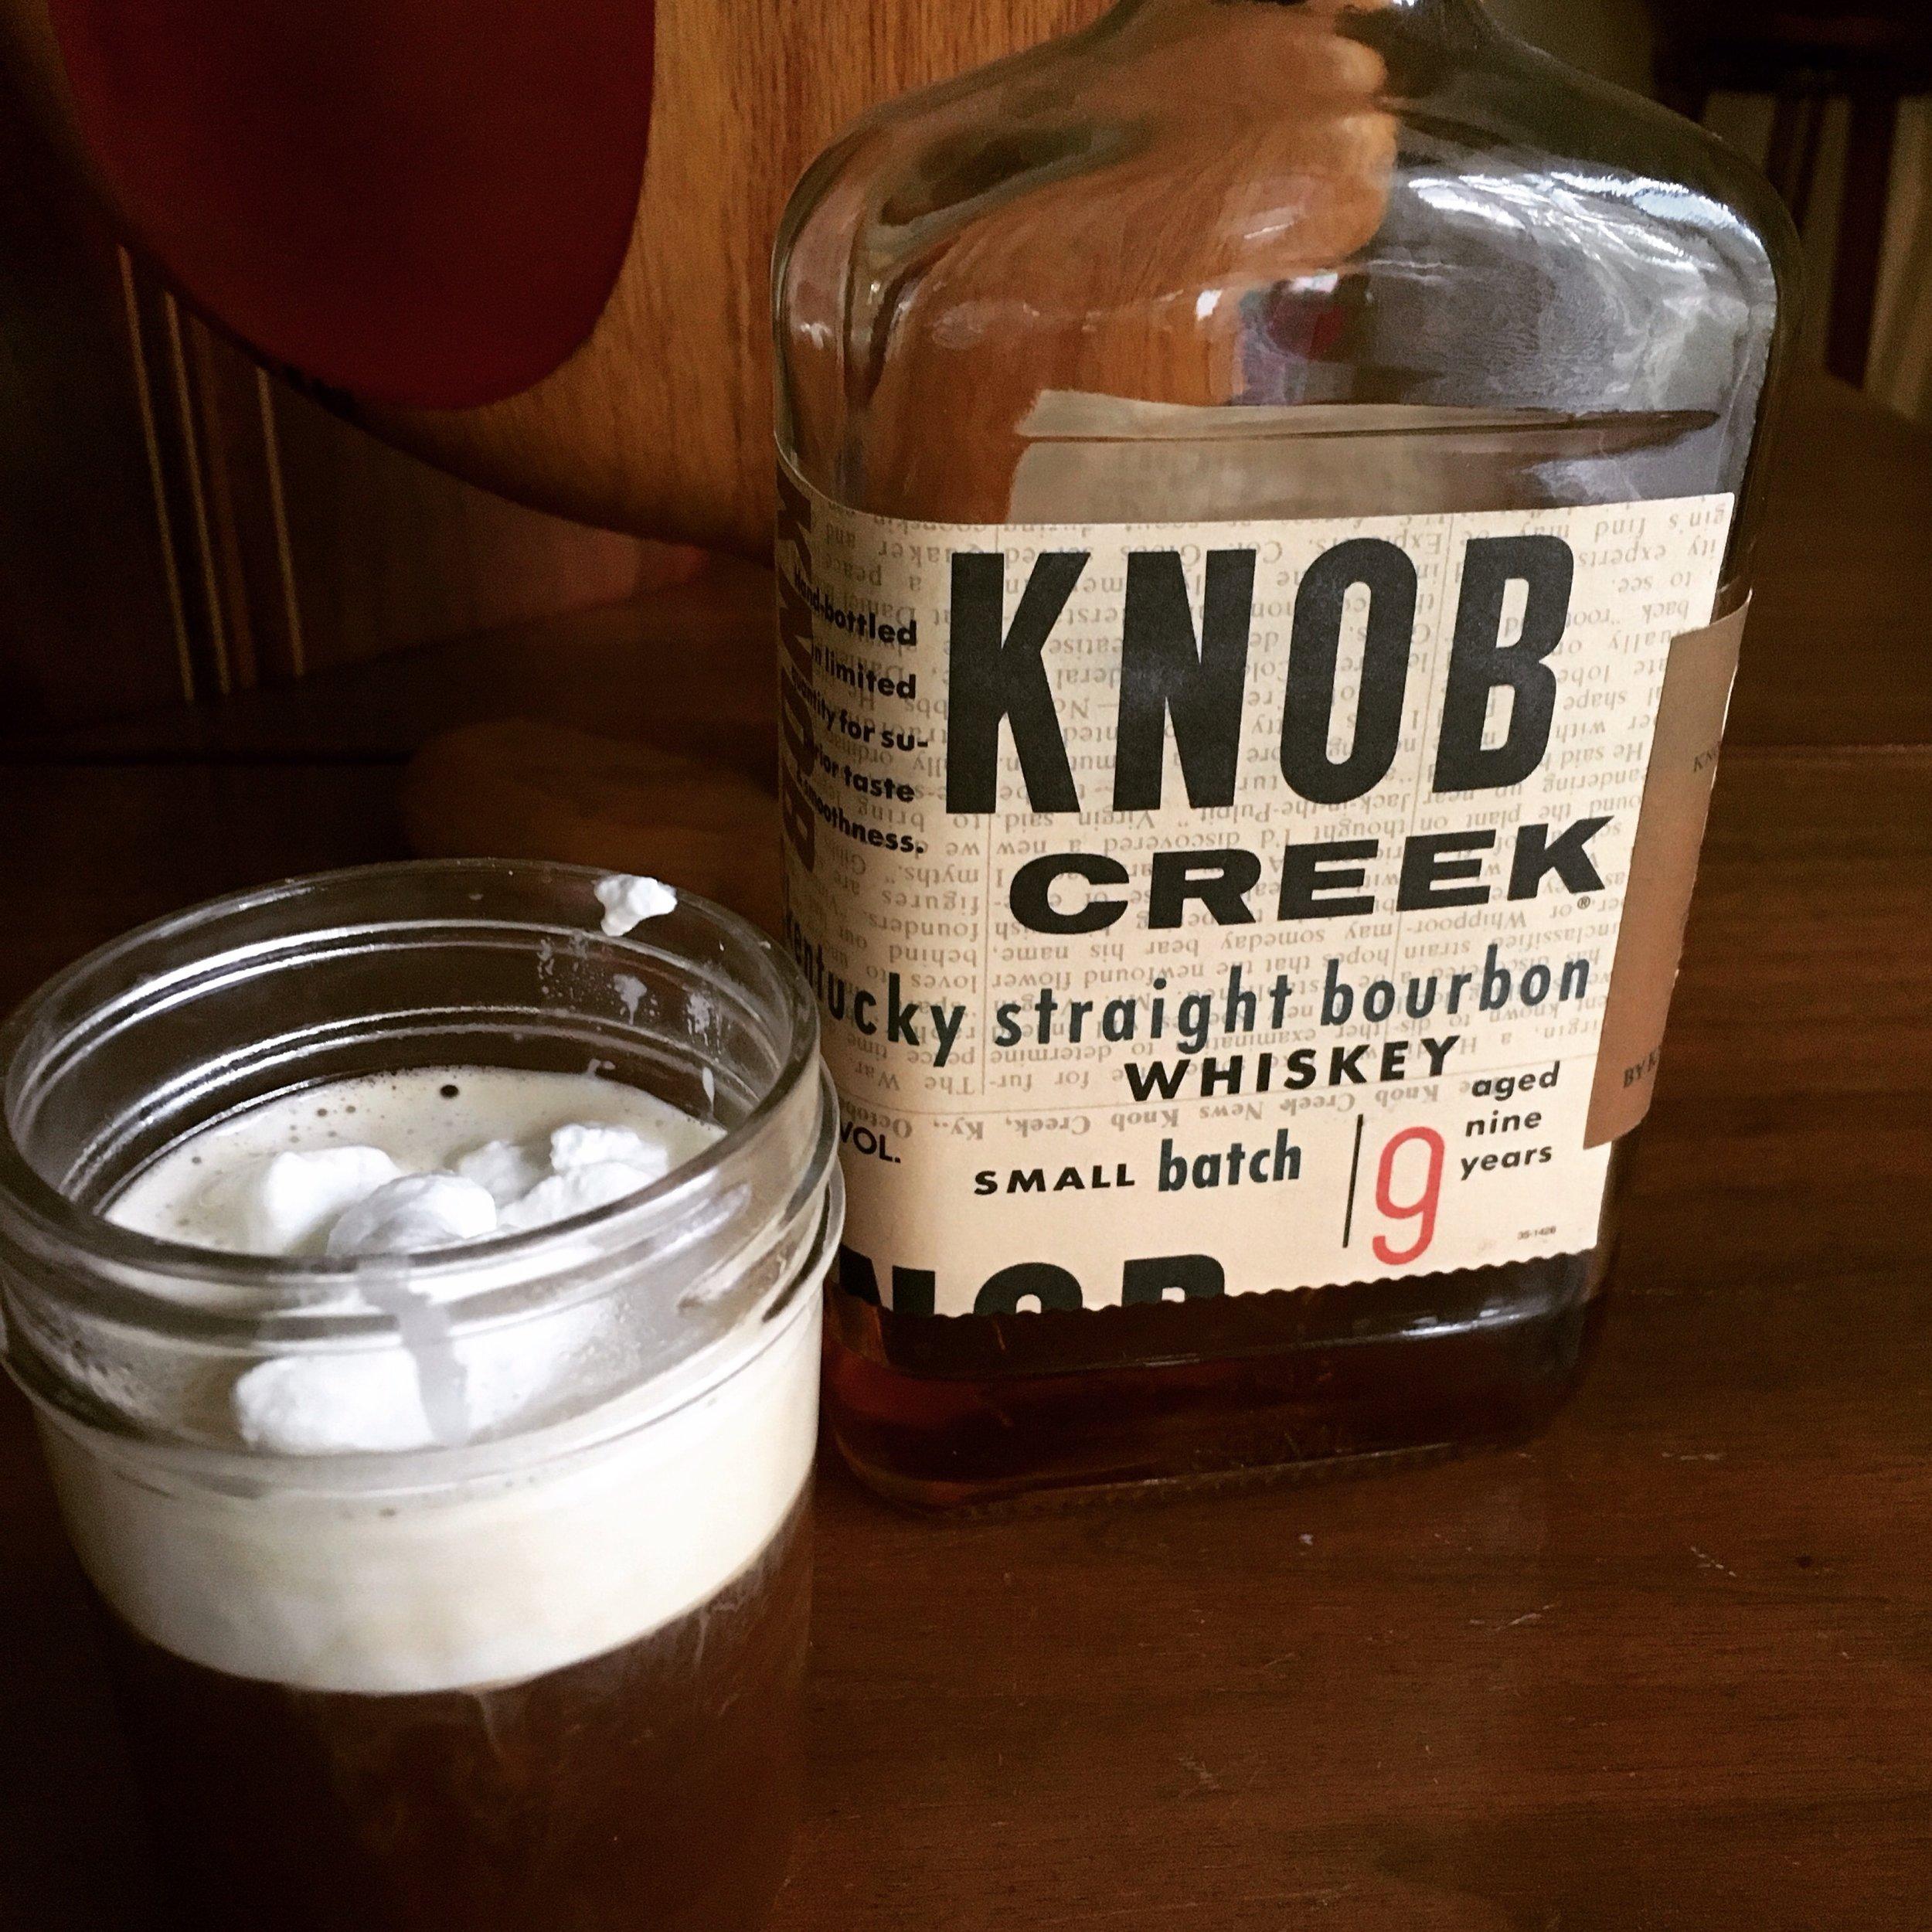 Hmmm...who's been drinking my Knob Creek 😂